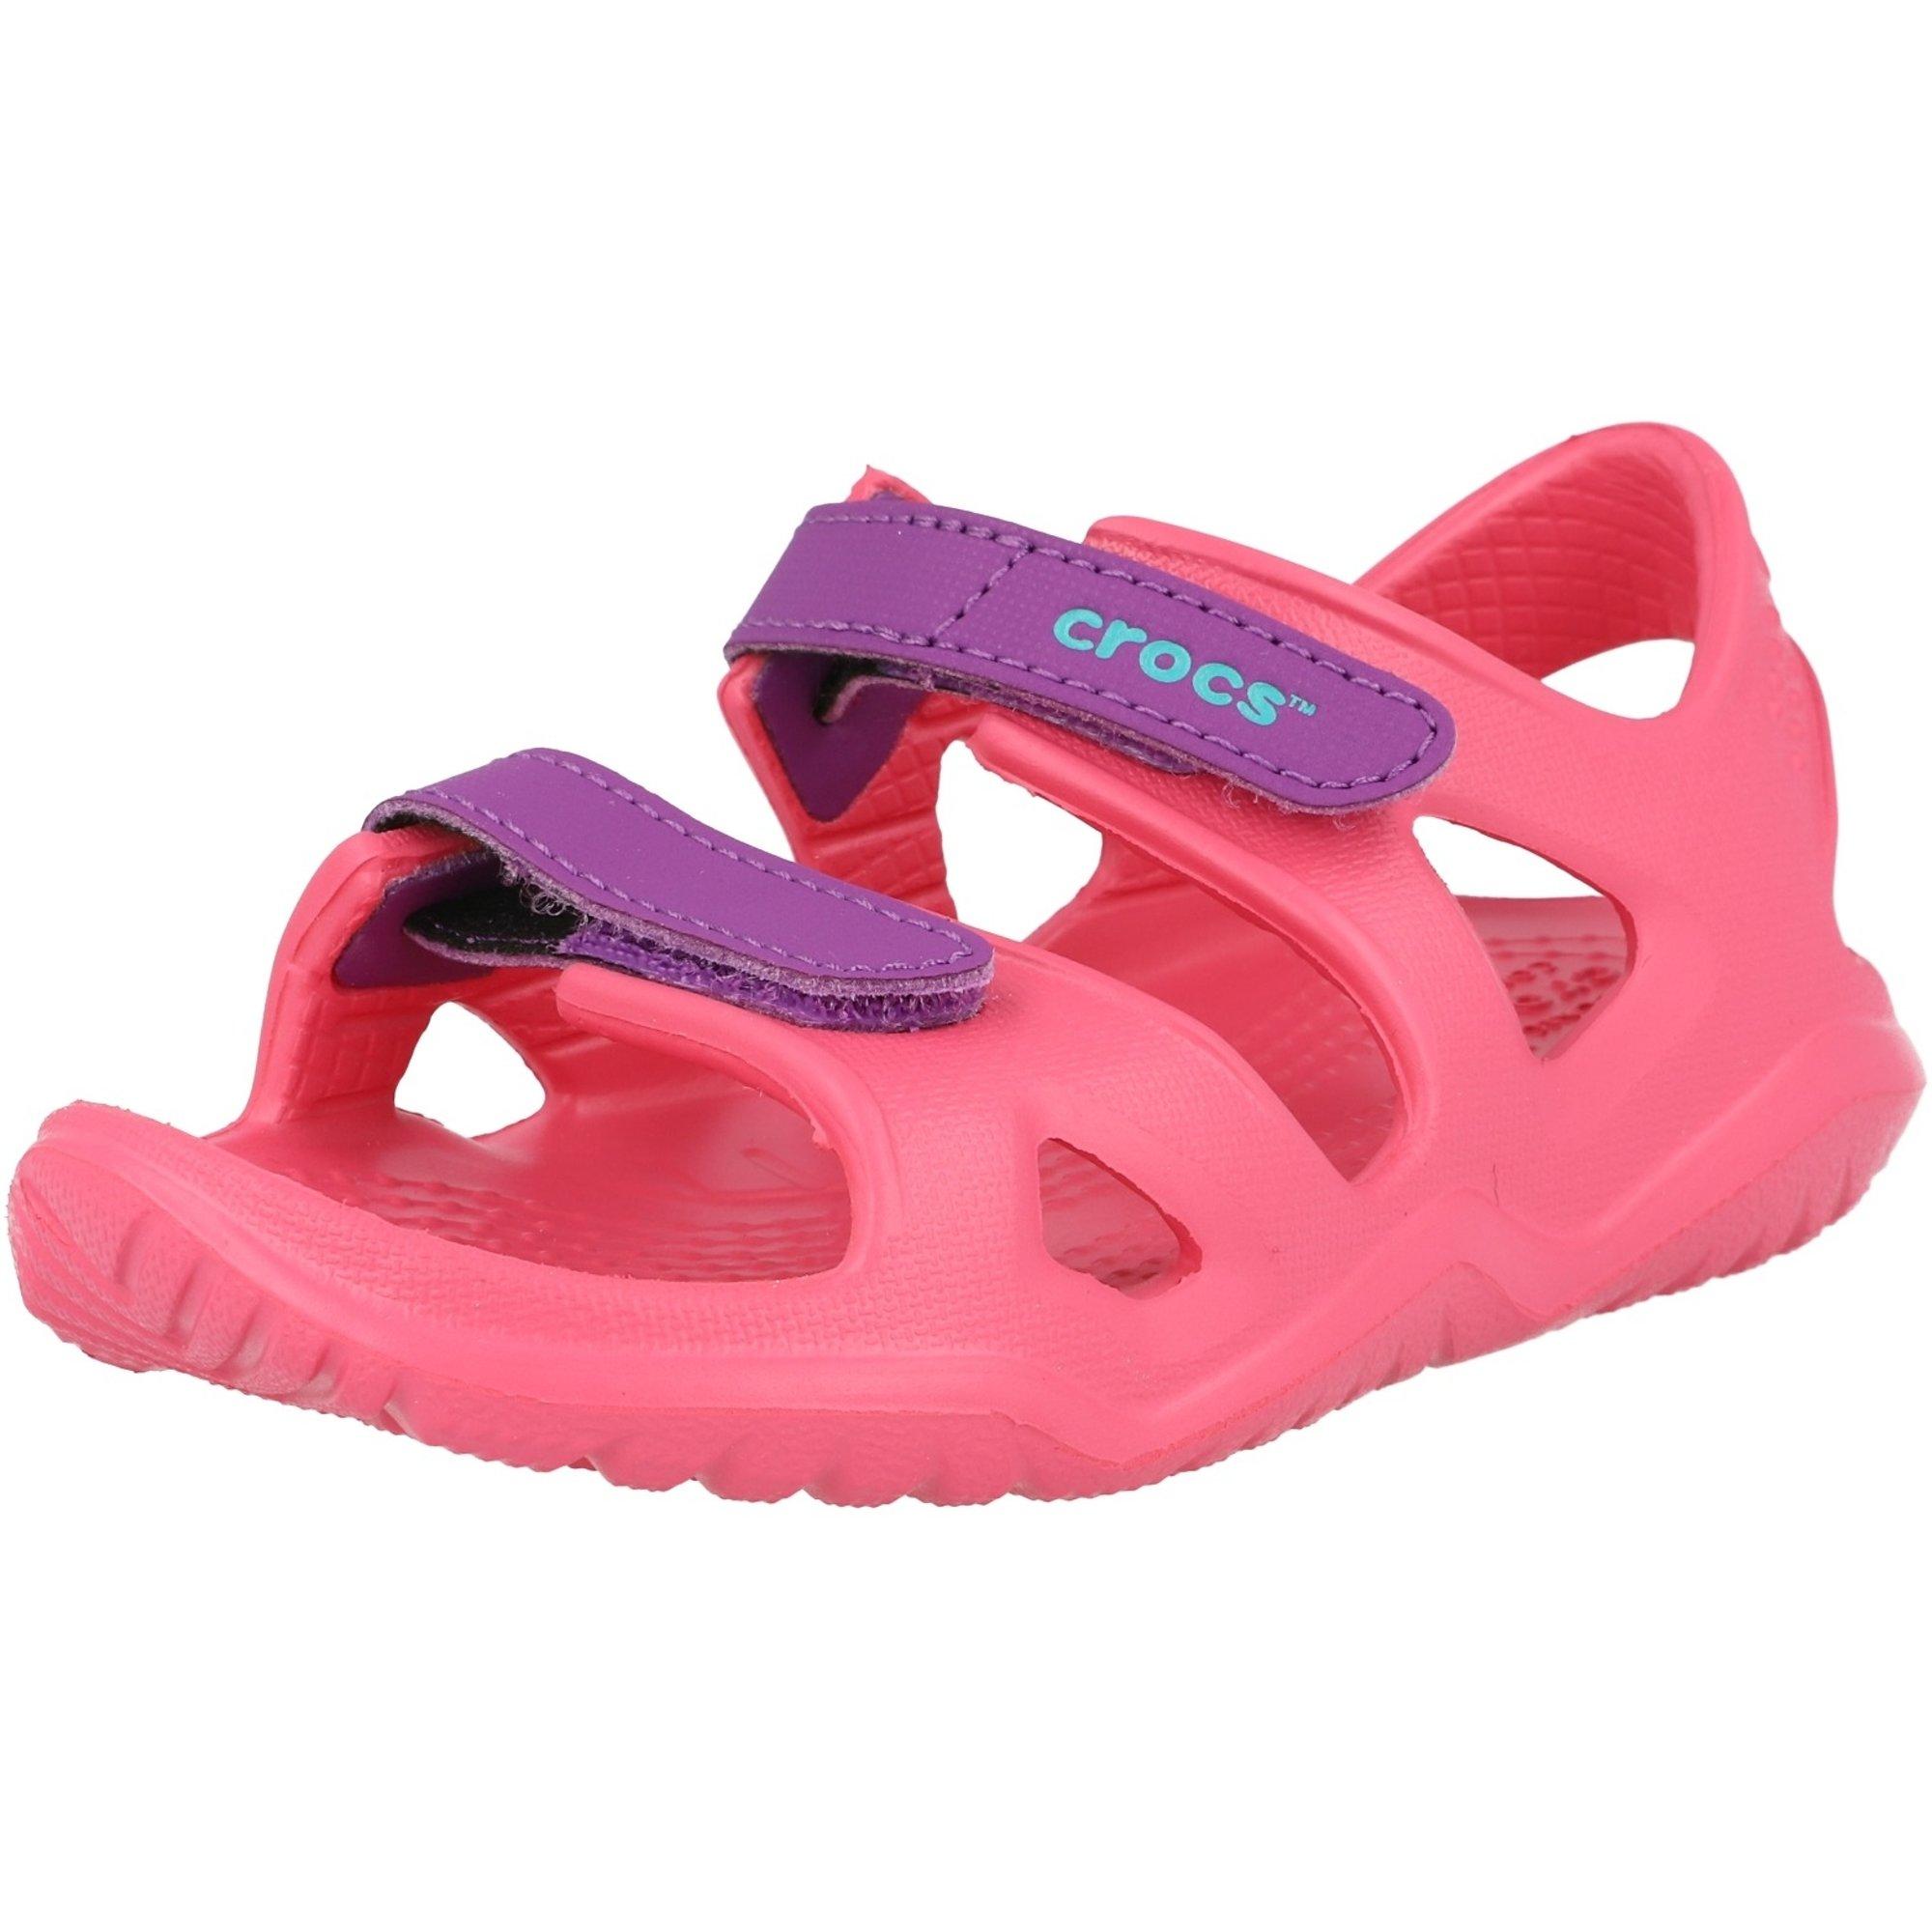 Crocs Swiftwater River Sandal K Paradise Pink Croslite